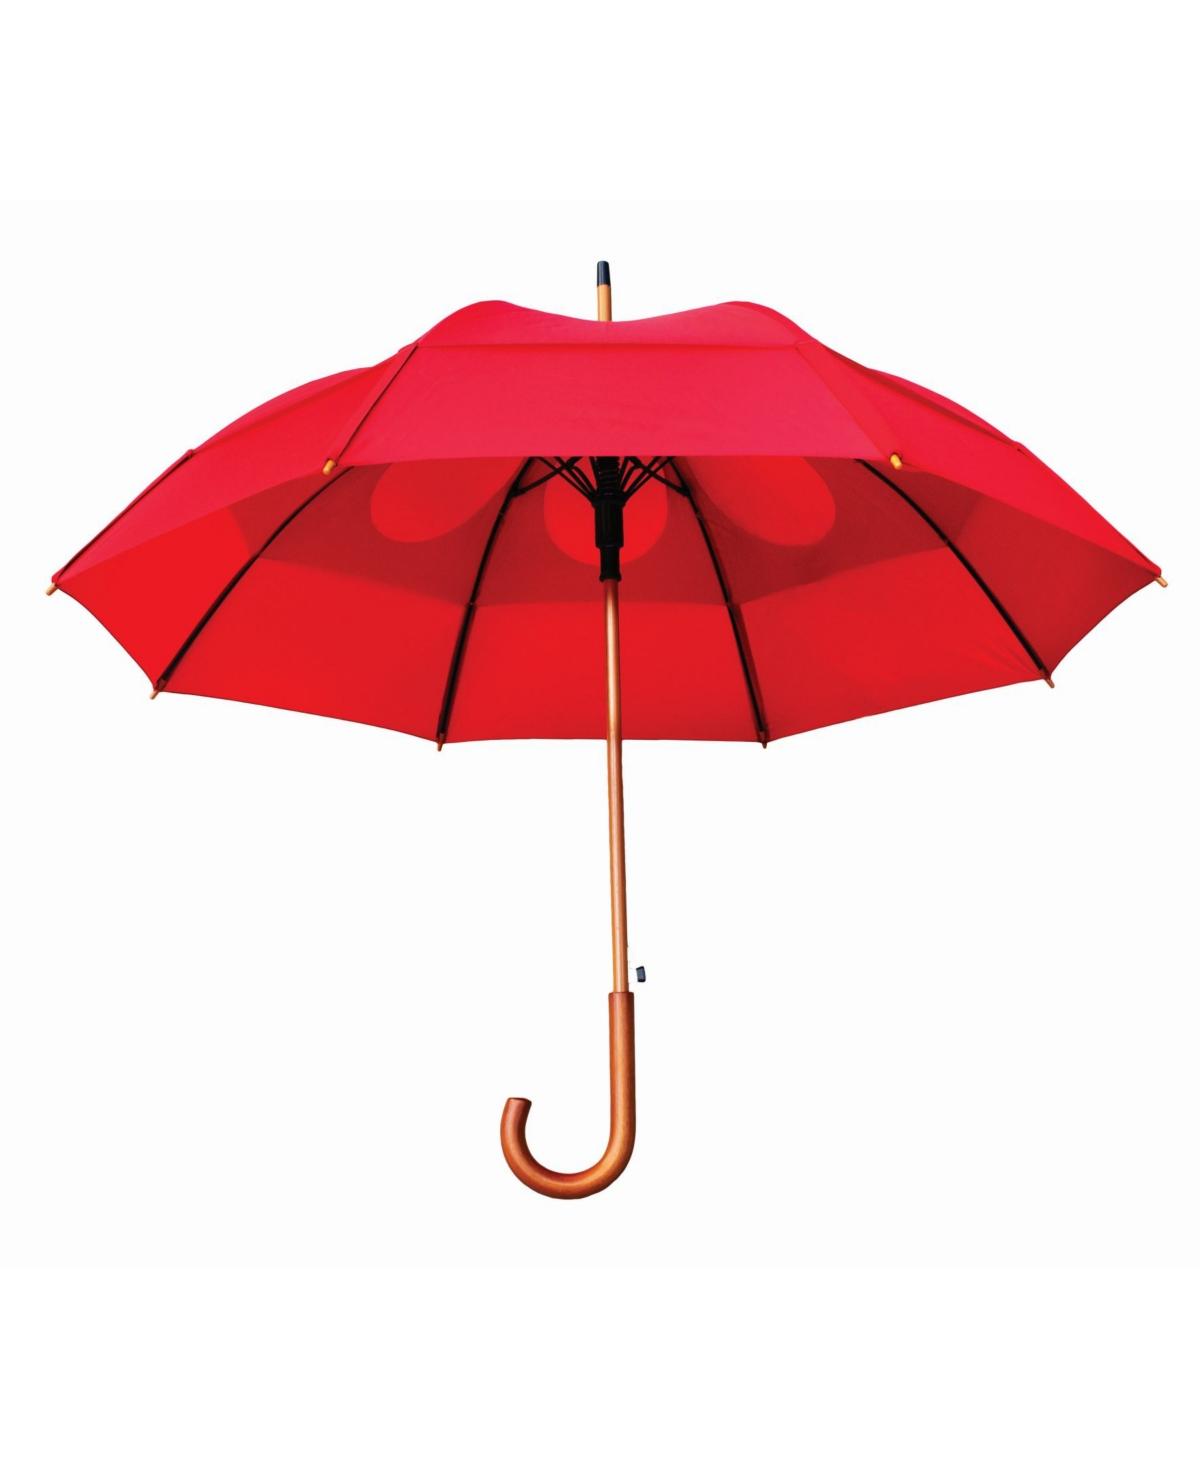 Gustbuster Wind Resistant Auto Open J-Shaped Handle Umbrella